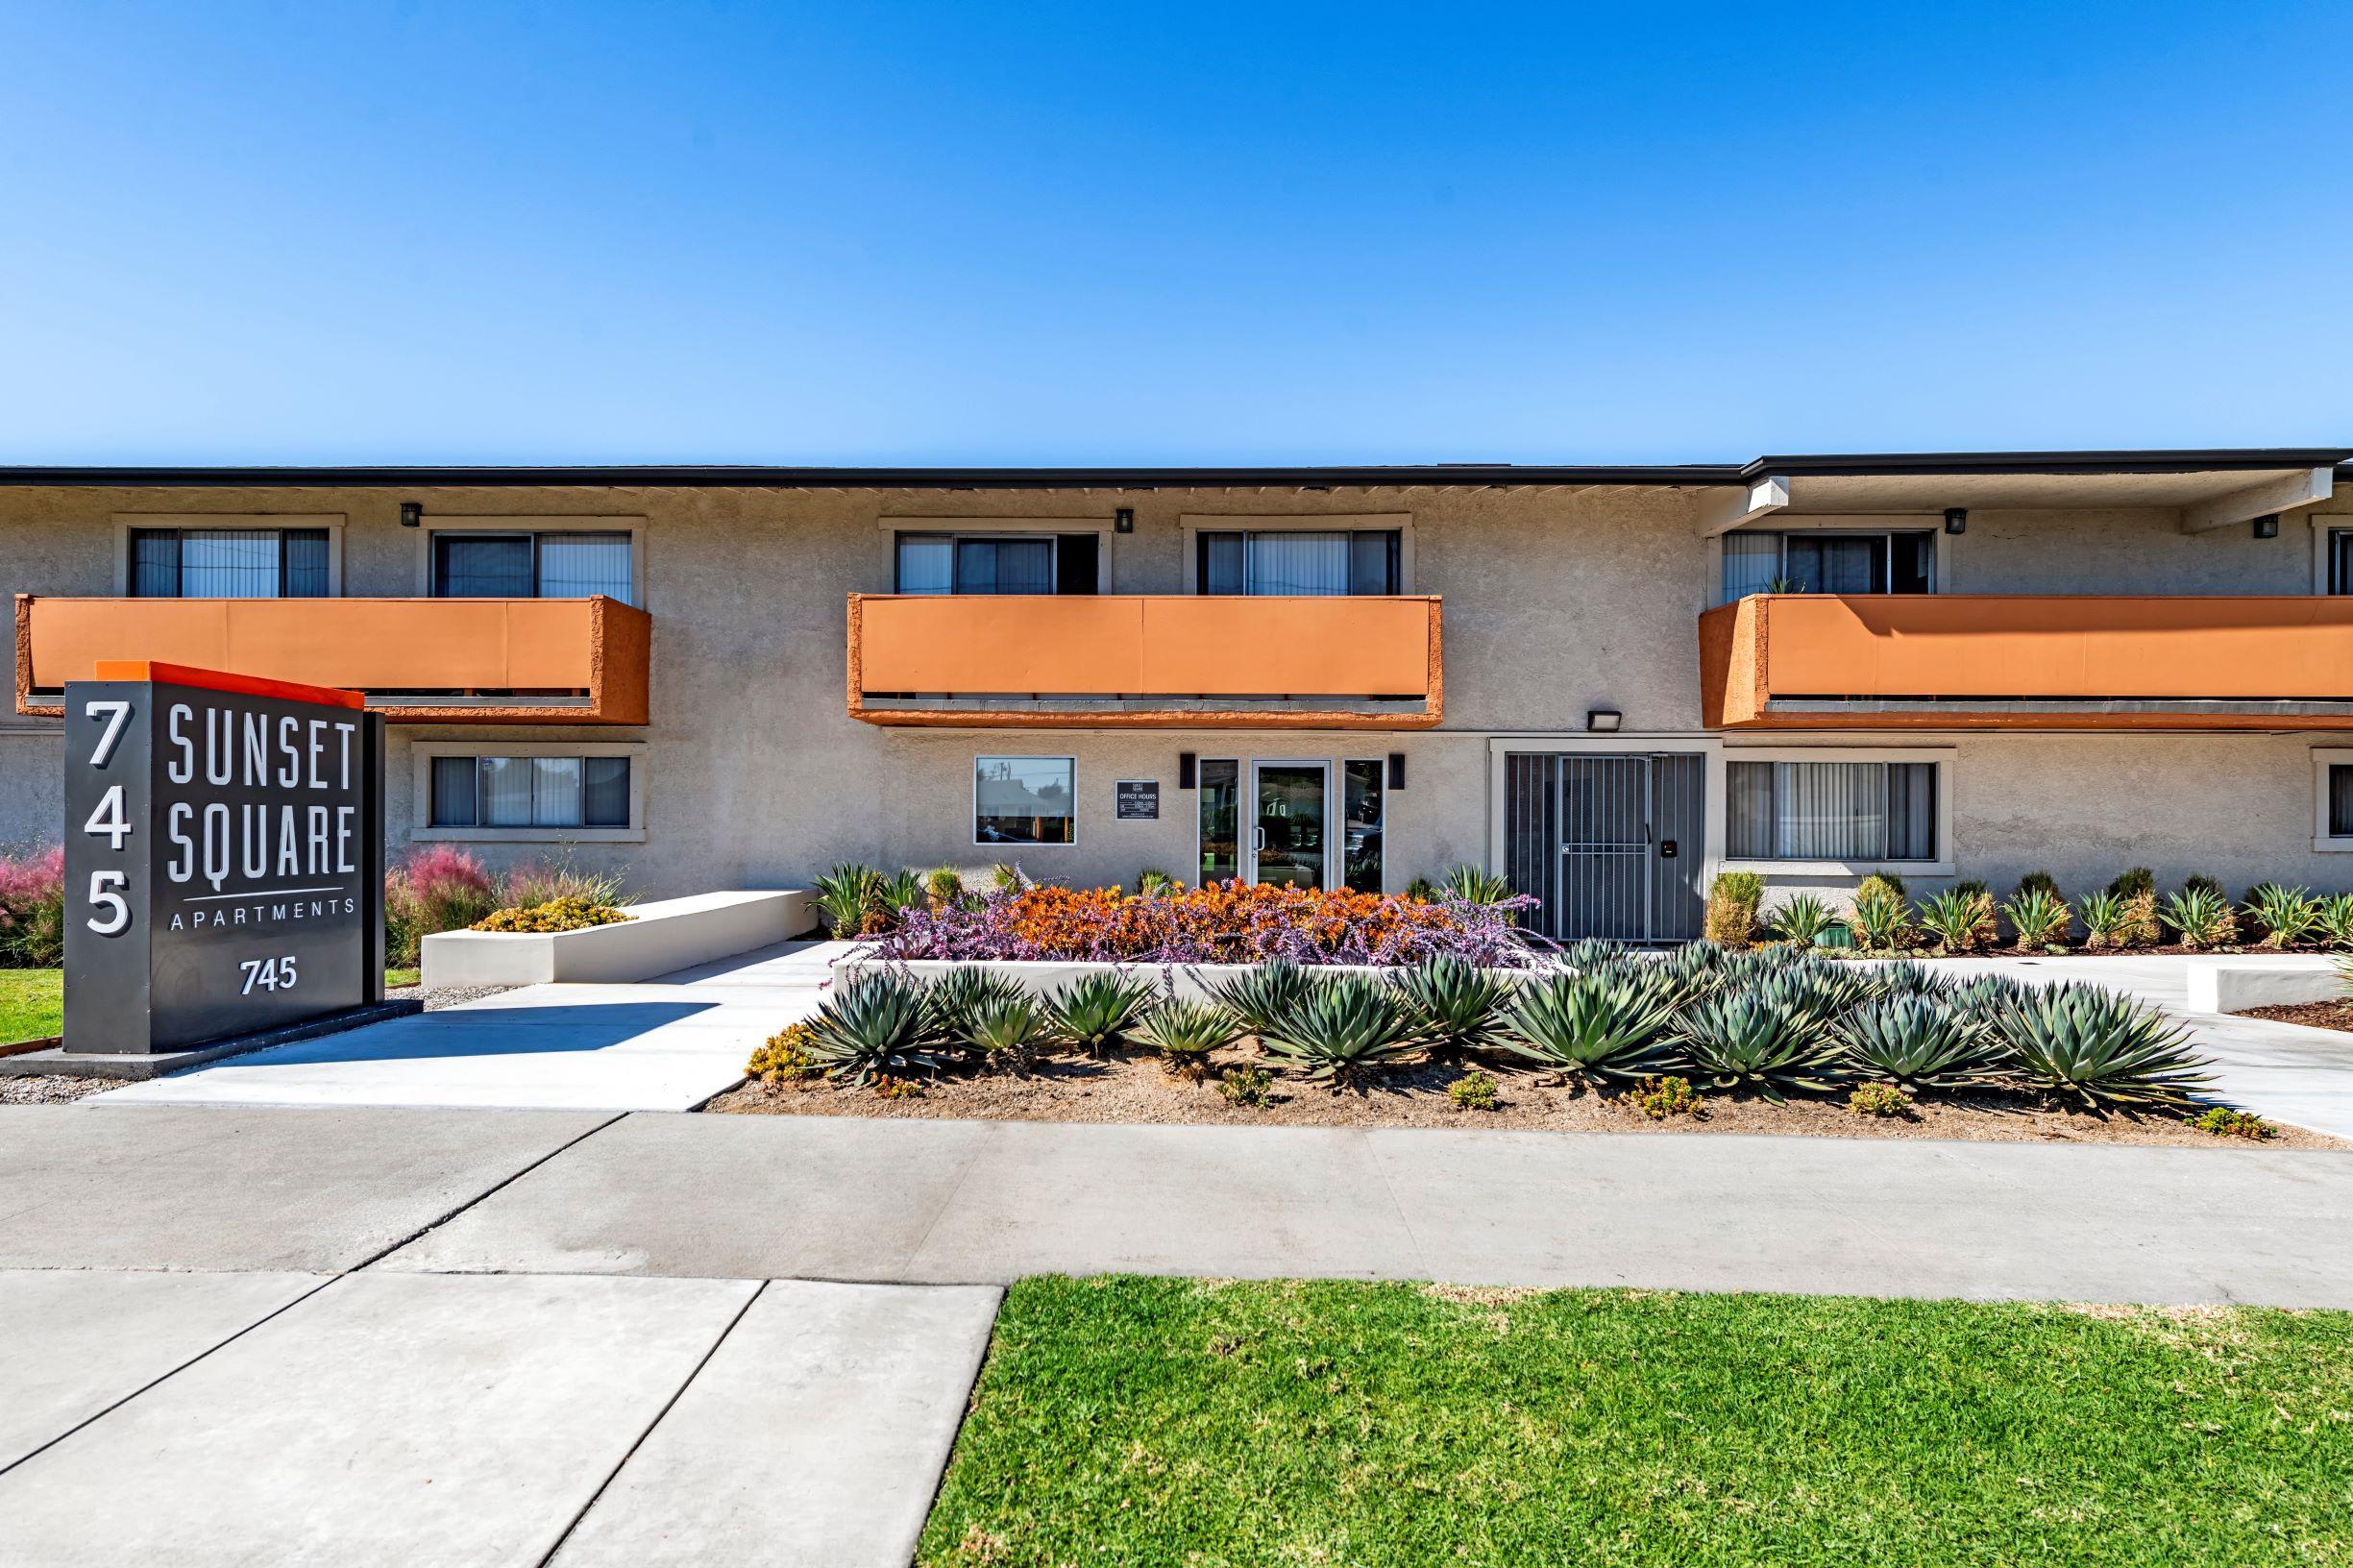 Apartments Near Biola Sunset Square for Biola University Students in La Mirada, CA